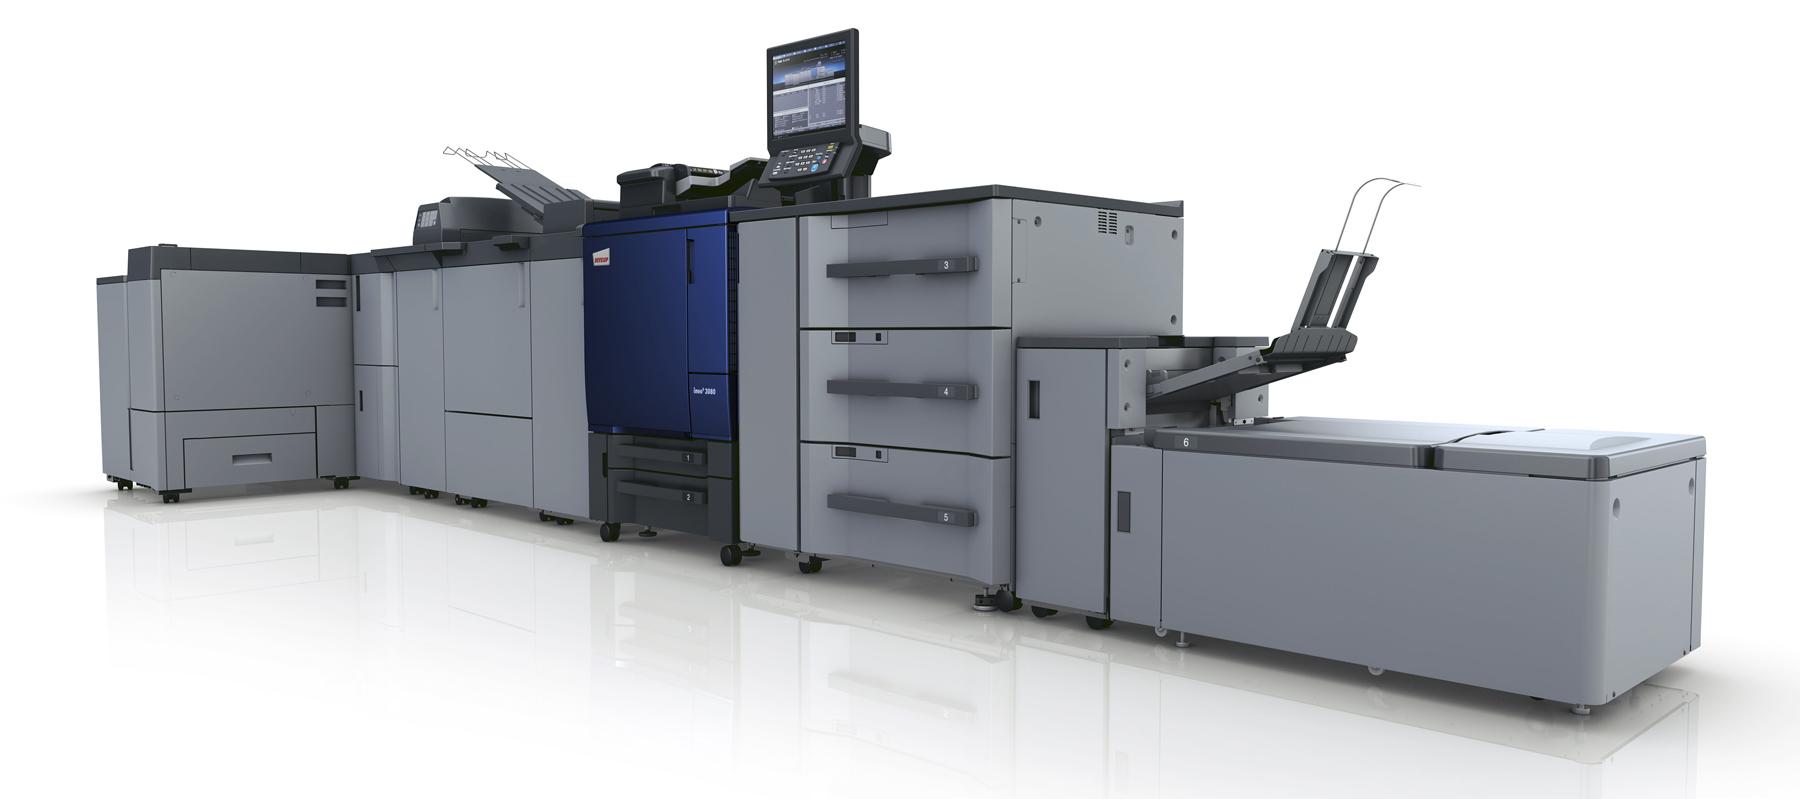 develop ineo 3080 druk cyfrowy